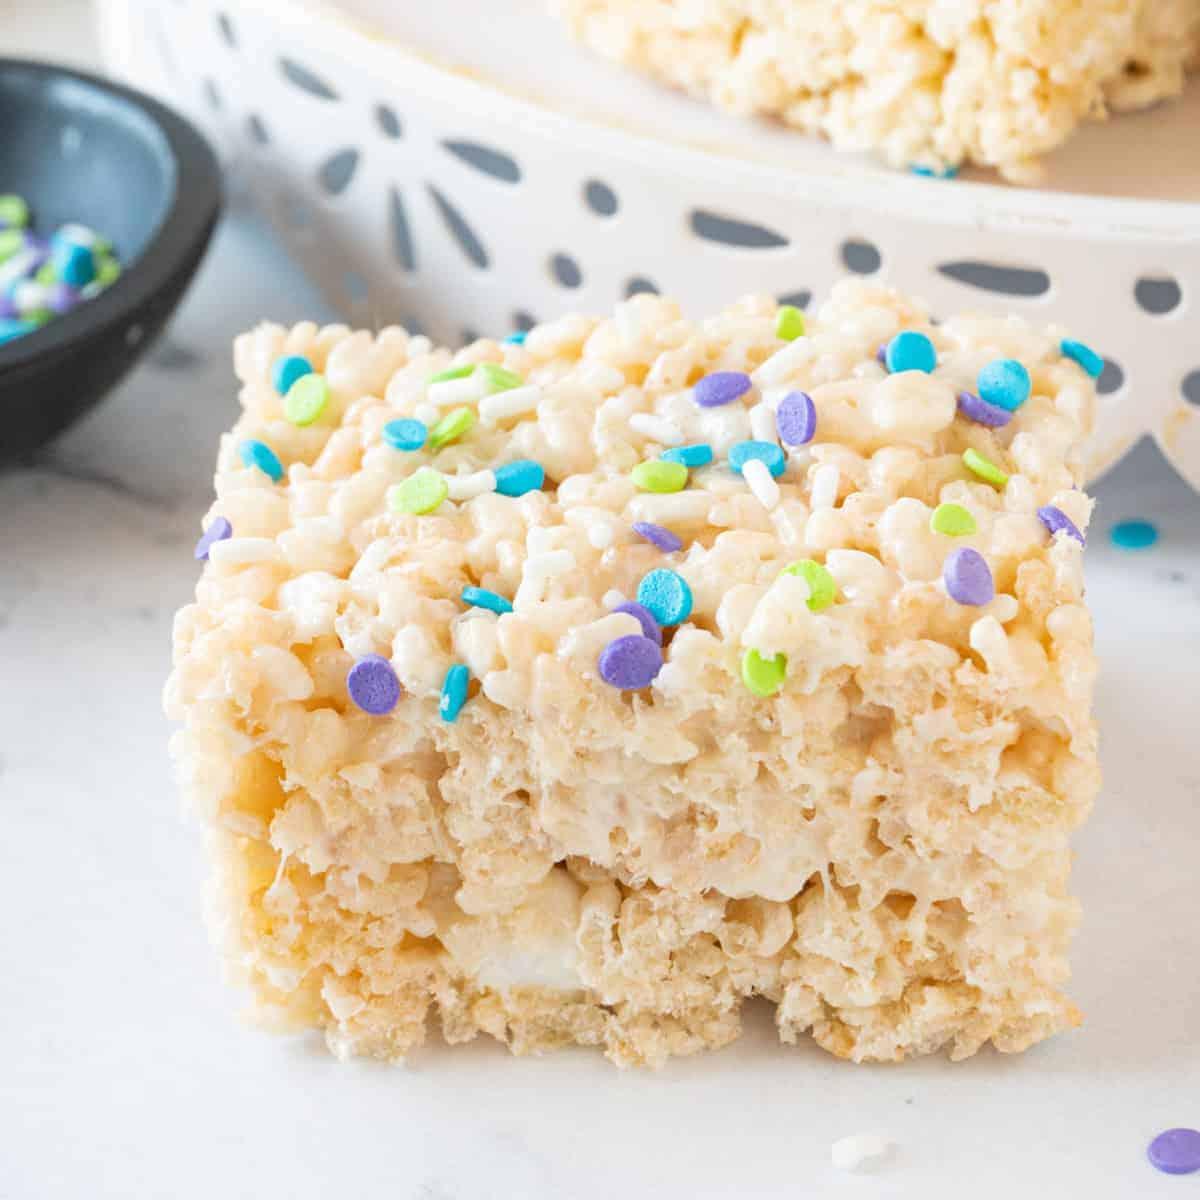 Rice Crispy Treat Featured Image